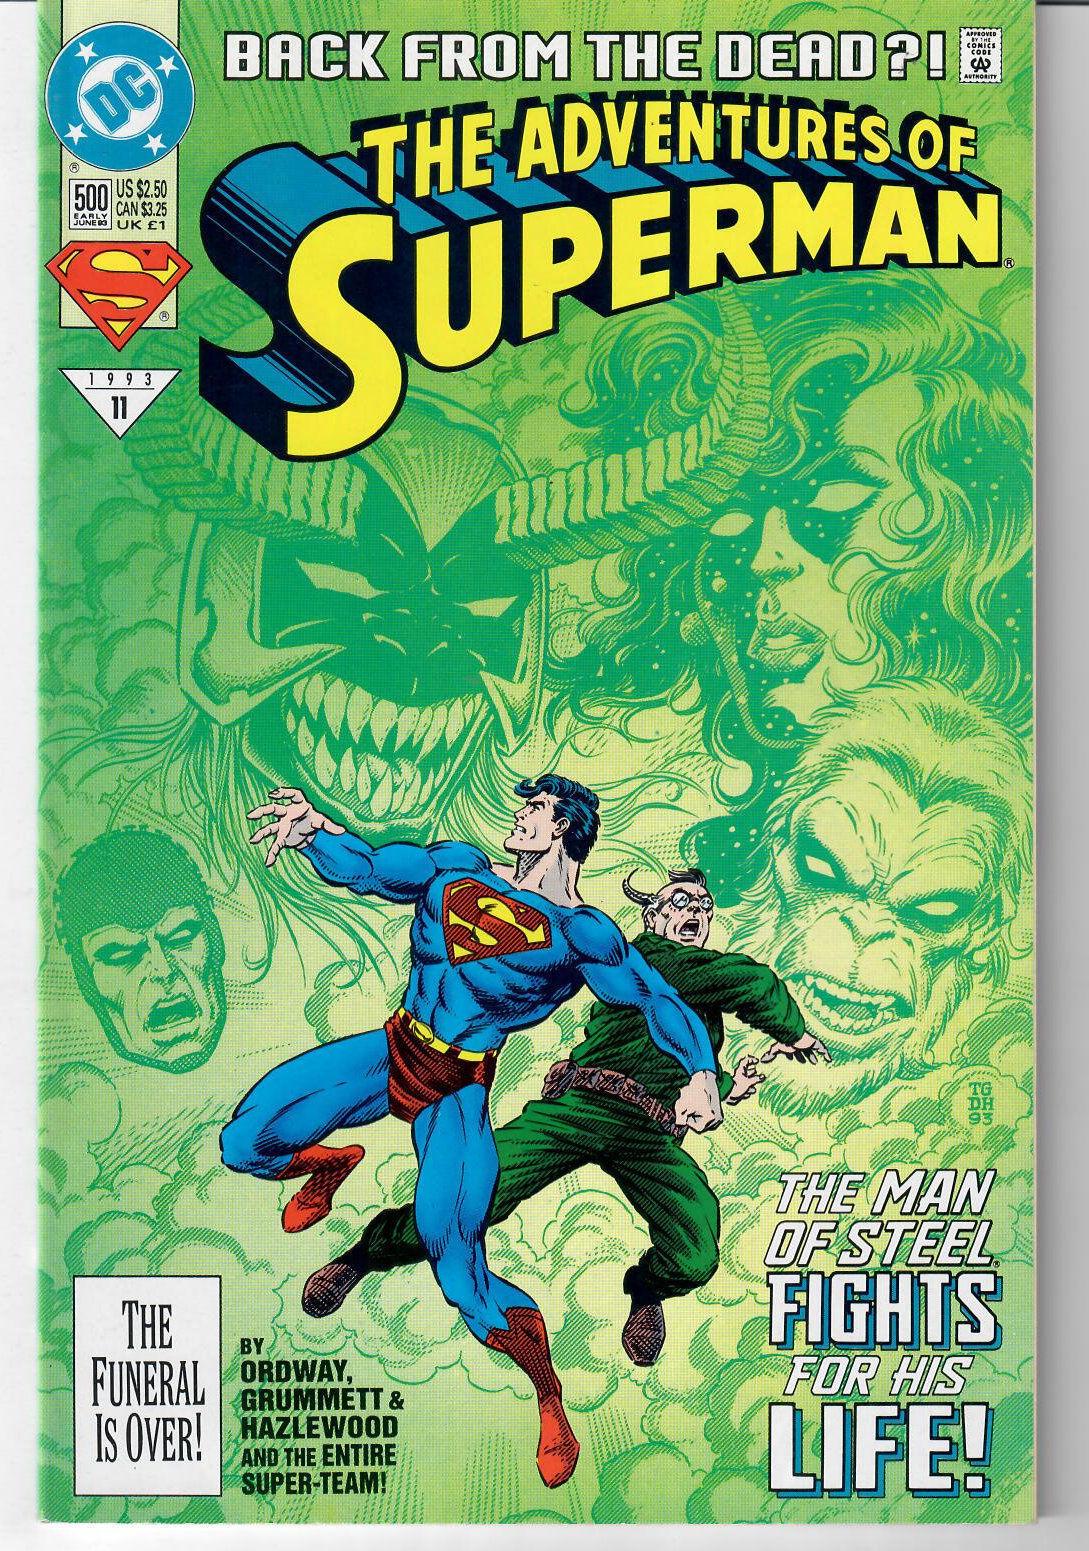 Adventures of Superman #500 (Art by Tom Grummett, Written by Jerry Ordway)